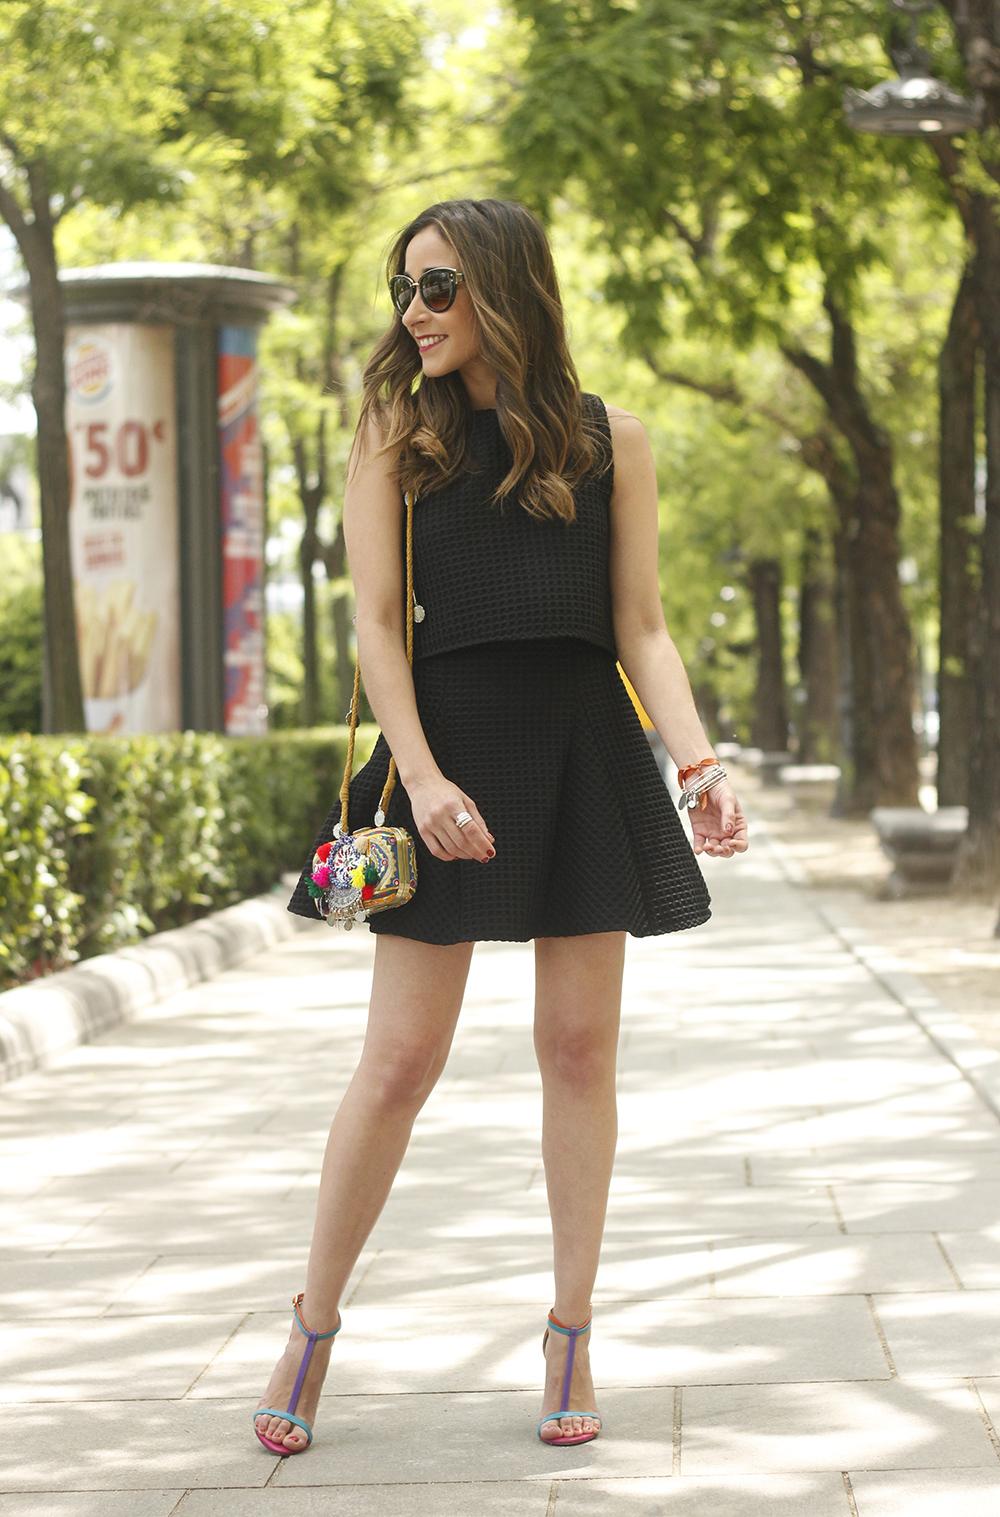 Little black dress maje carolina herrera sandals bag outfit fashion style summer sunnies02